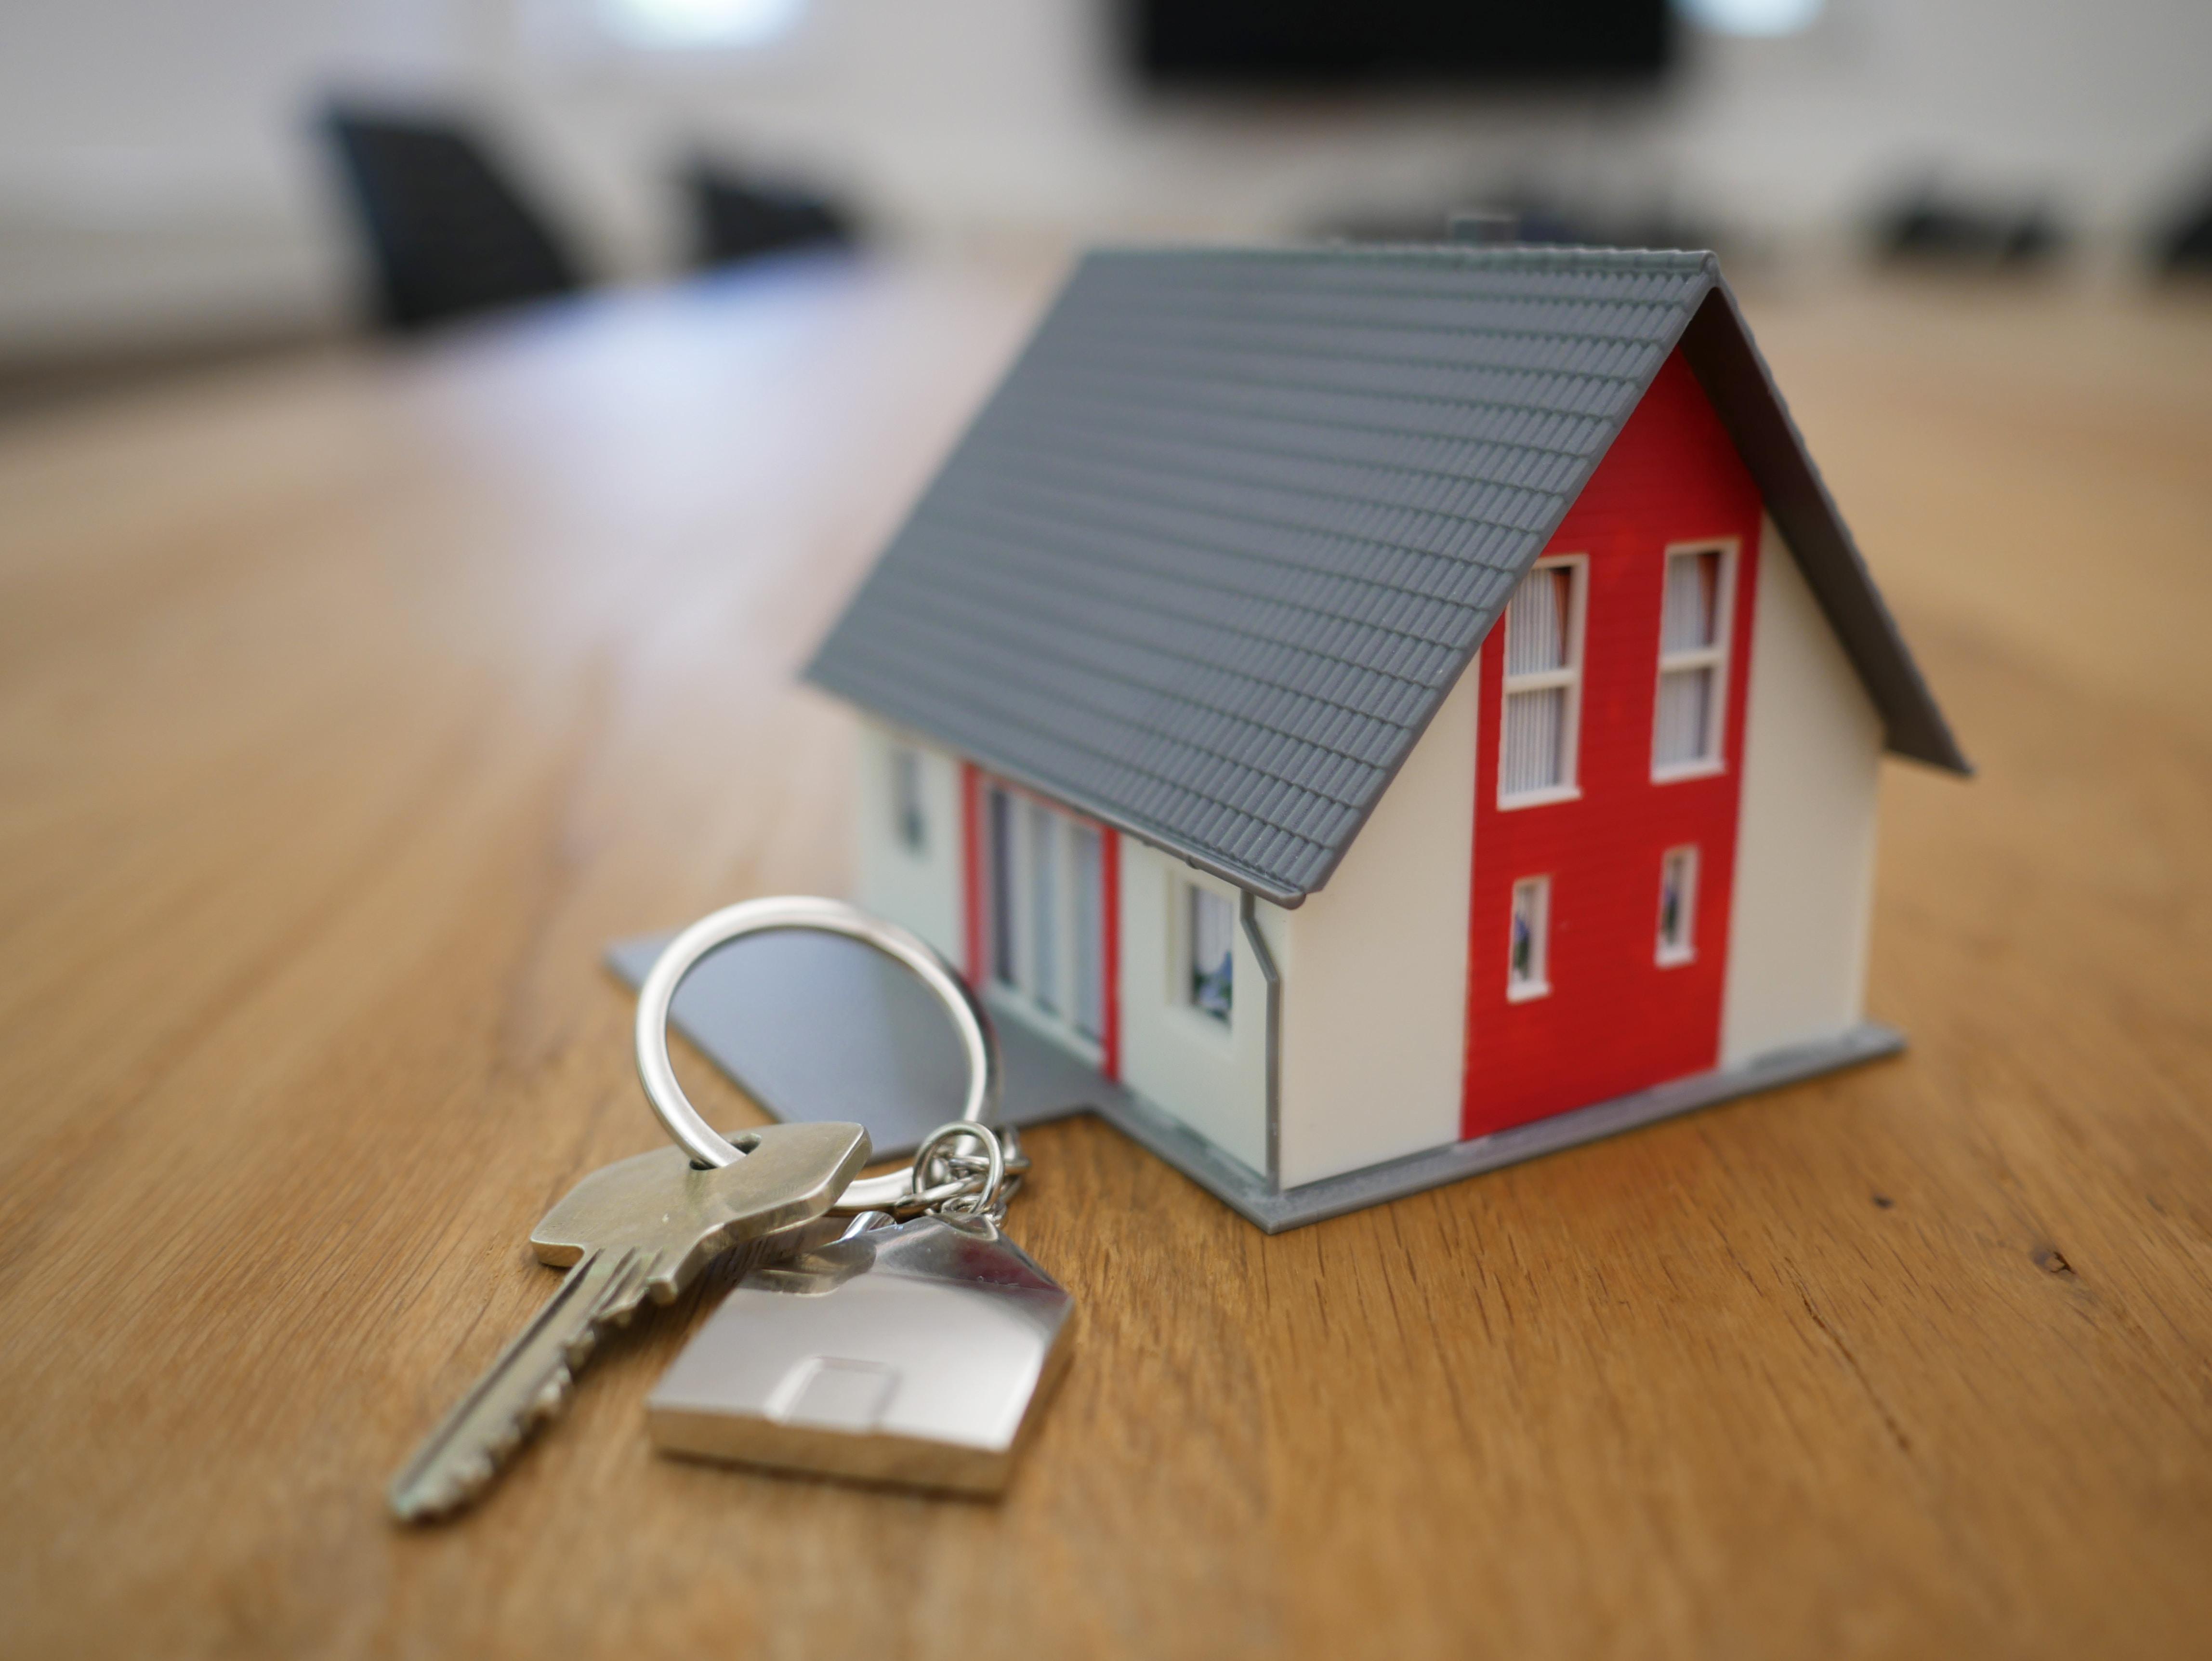 Property taxation 2017-2020, hmrc, income tax, capital gains tax, tax relief, cgt, property income tax